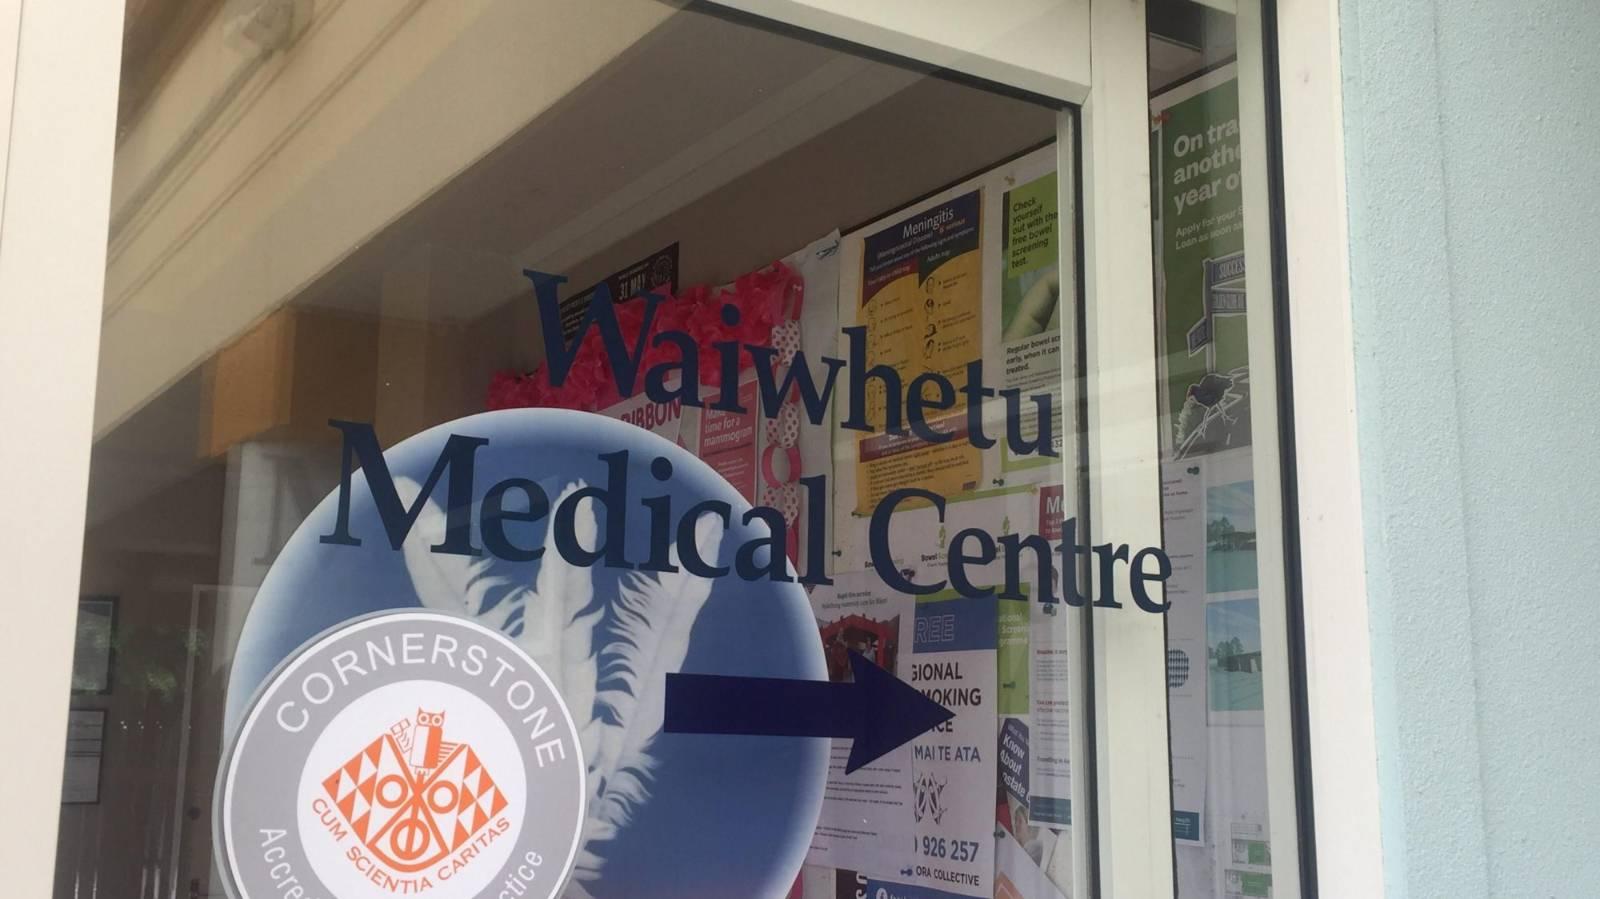 Financial problems caused mass resignations at medical centre - Rūnanga